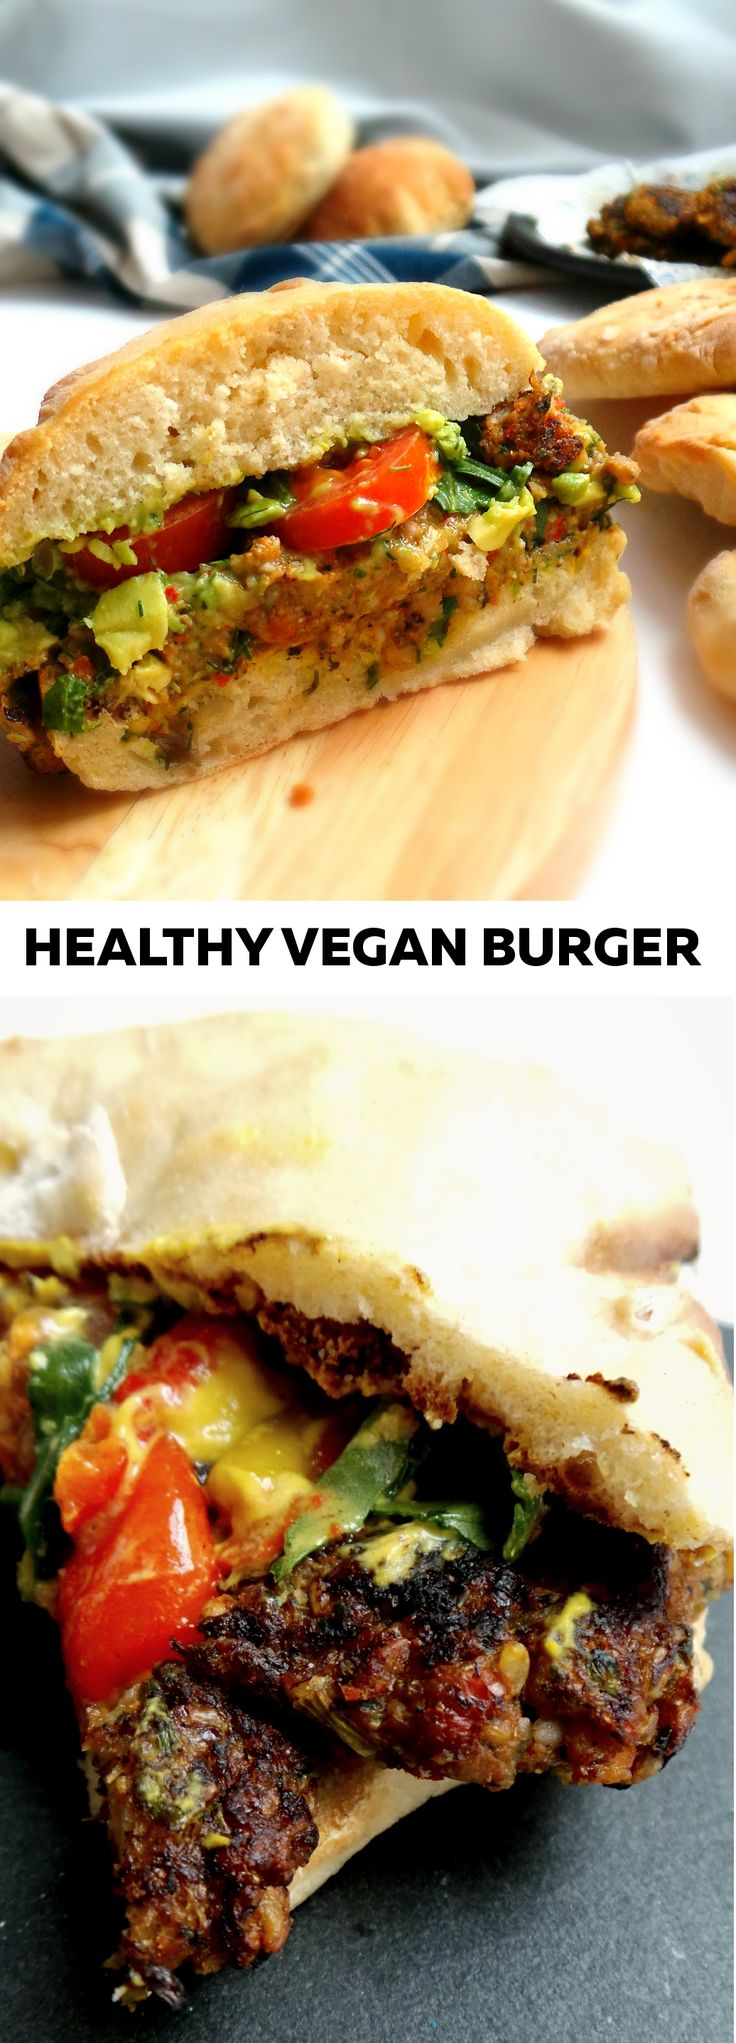 Healthy vegan burger with mushrooms and avocado sauce